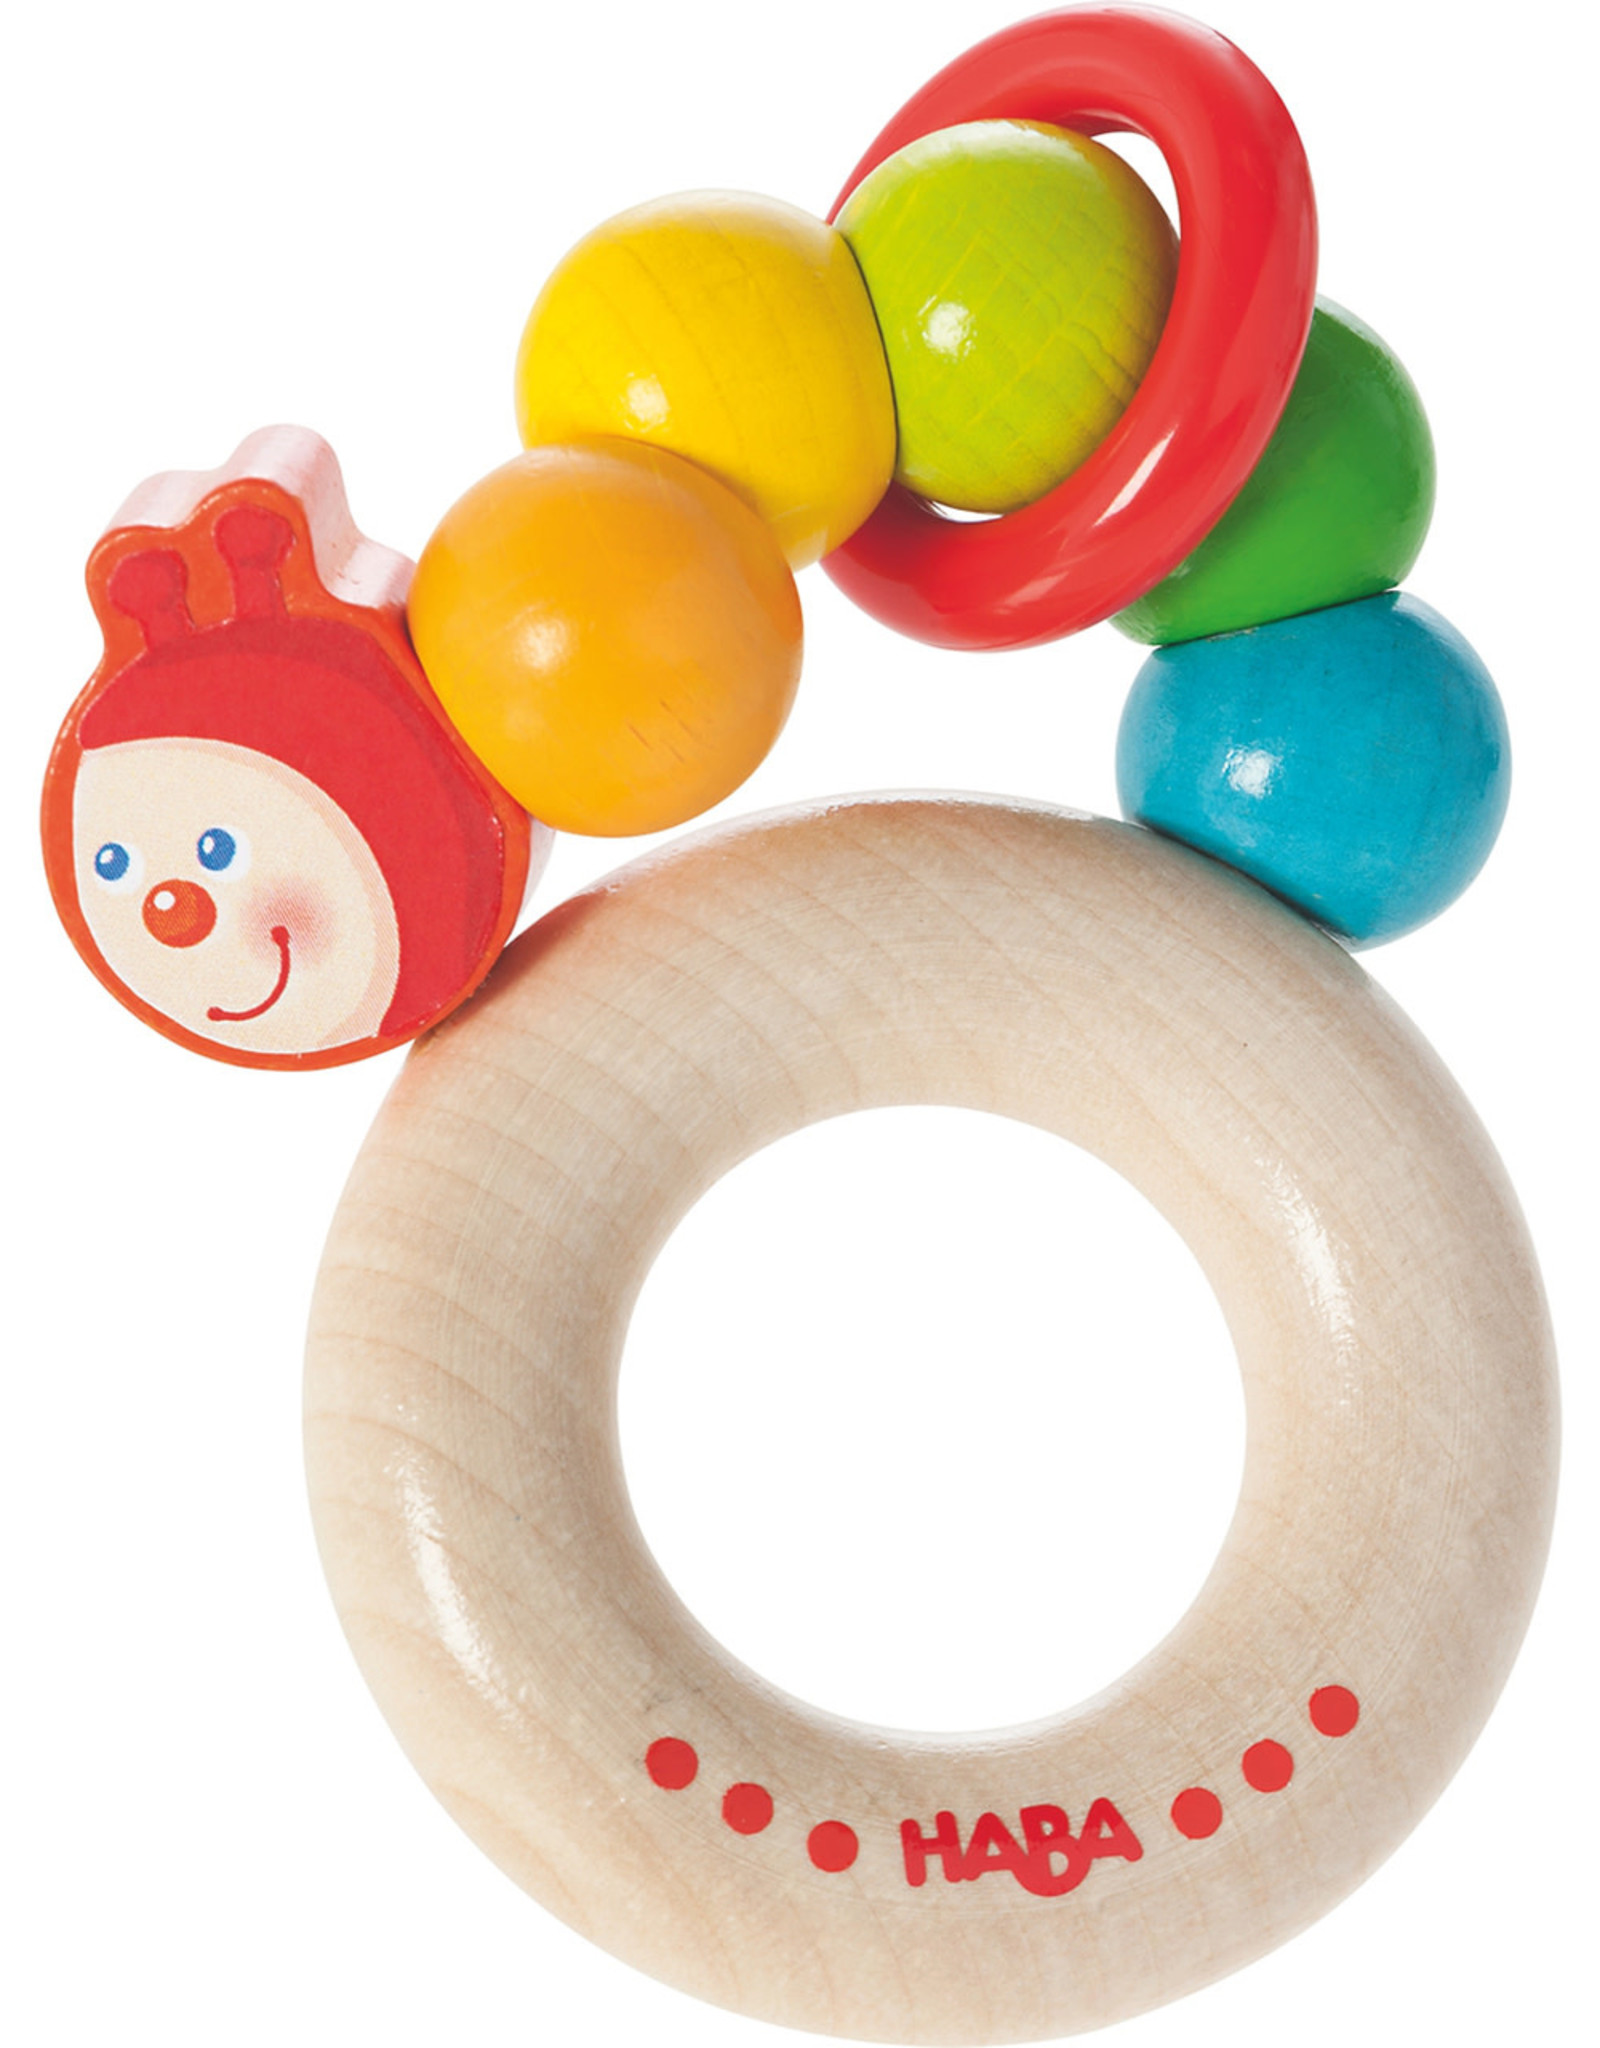 Haba Clutching Toy Rainbow Caterpillar